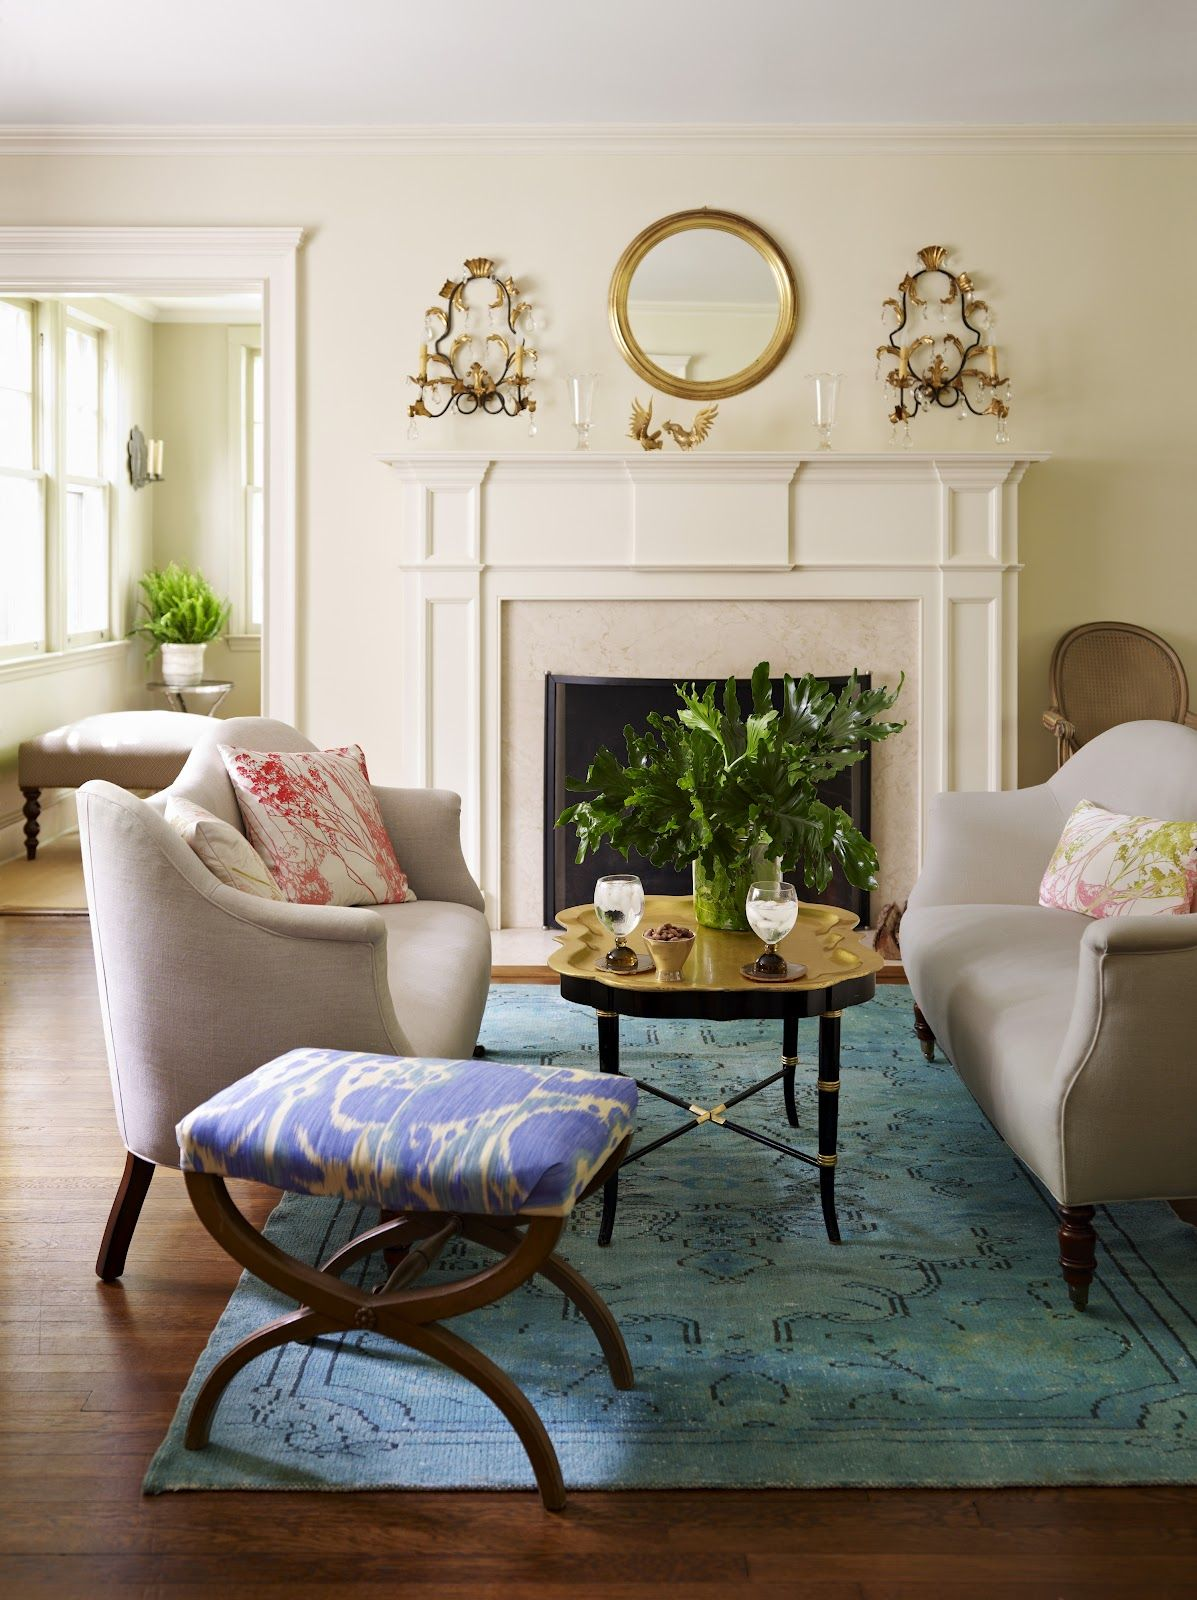 Interior Design Photos For Living Room: Caitlin Wilson Design: Style Files: Good Bones, Great